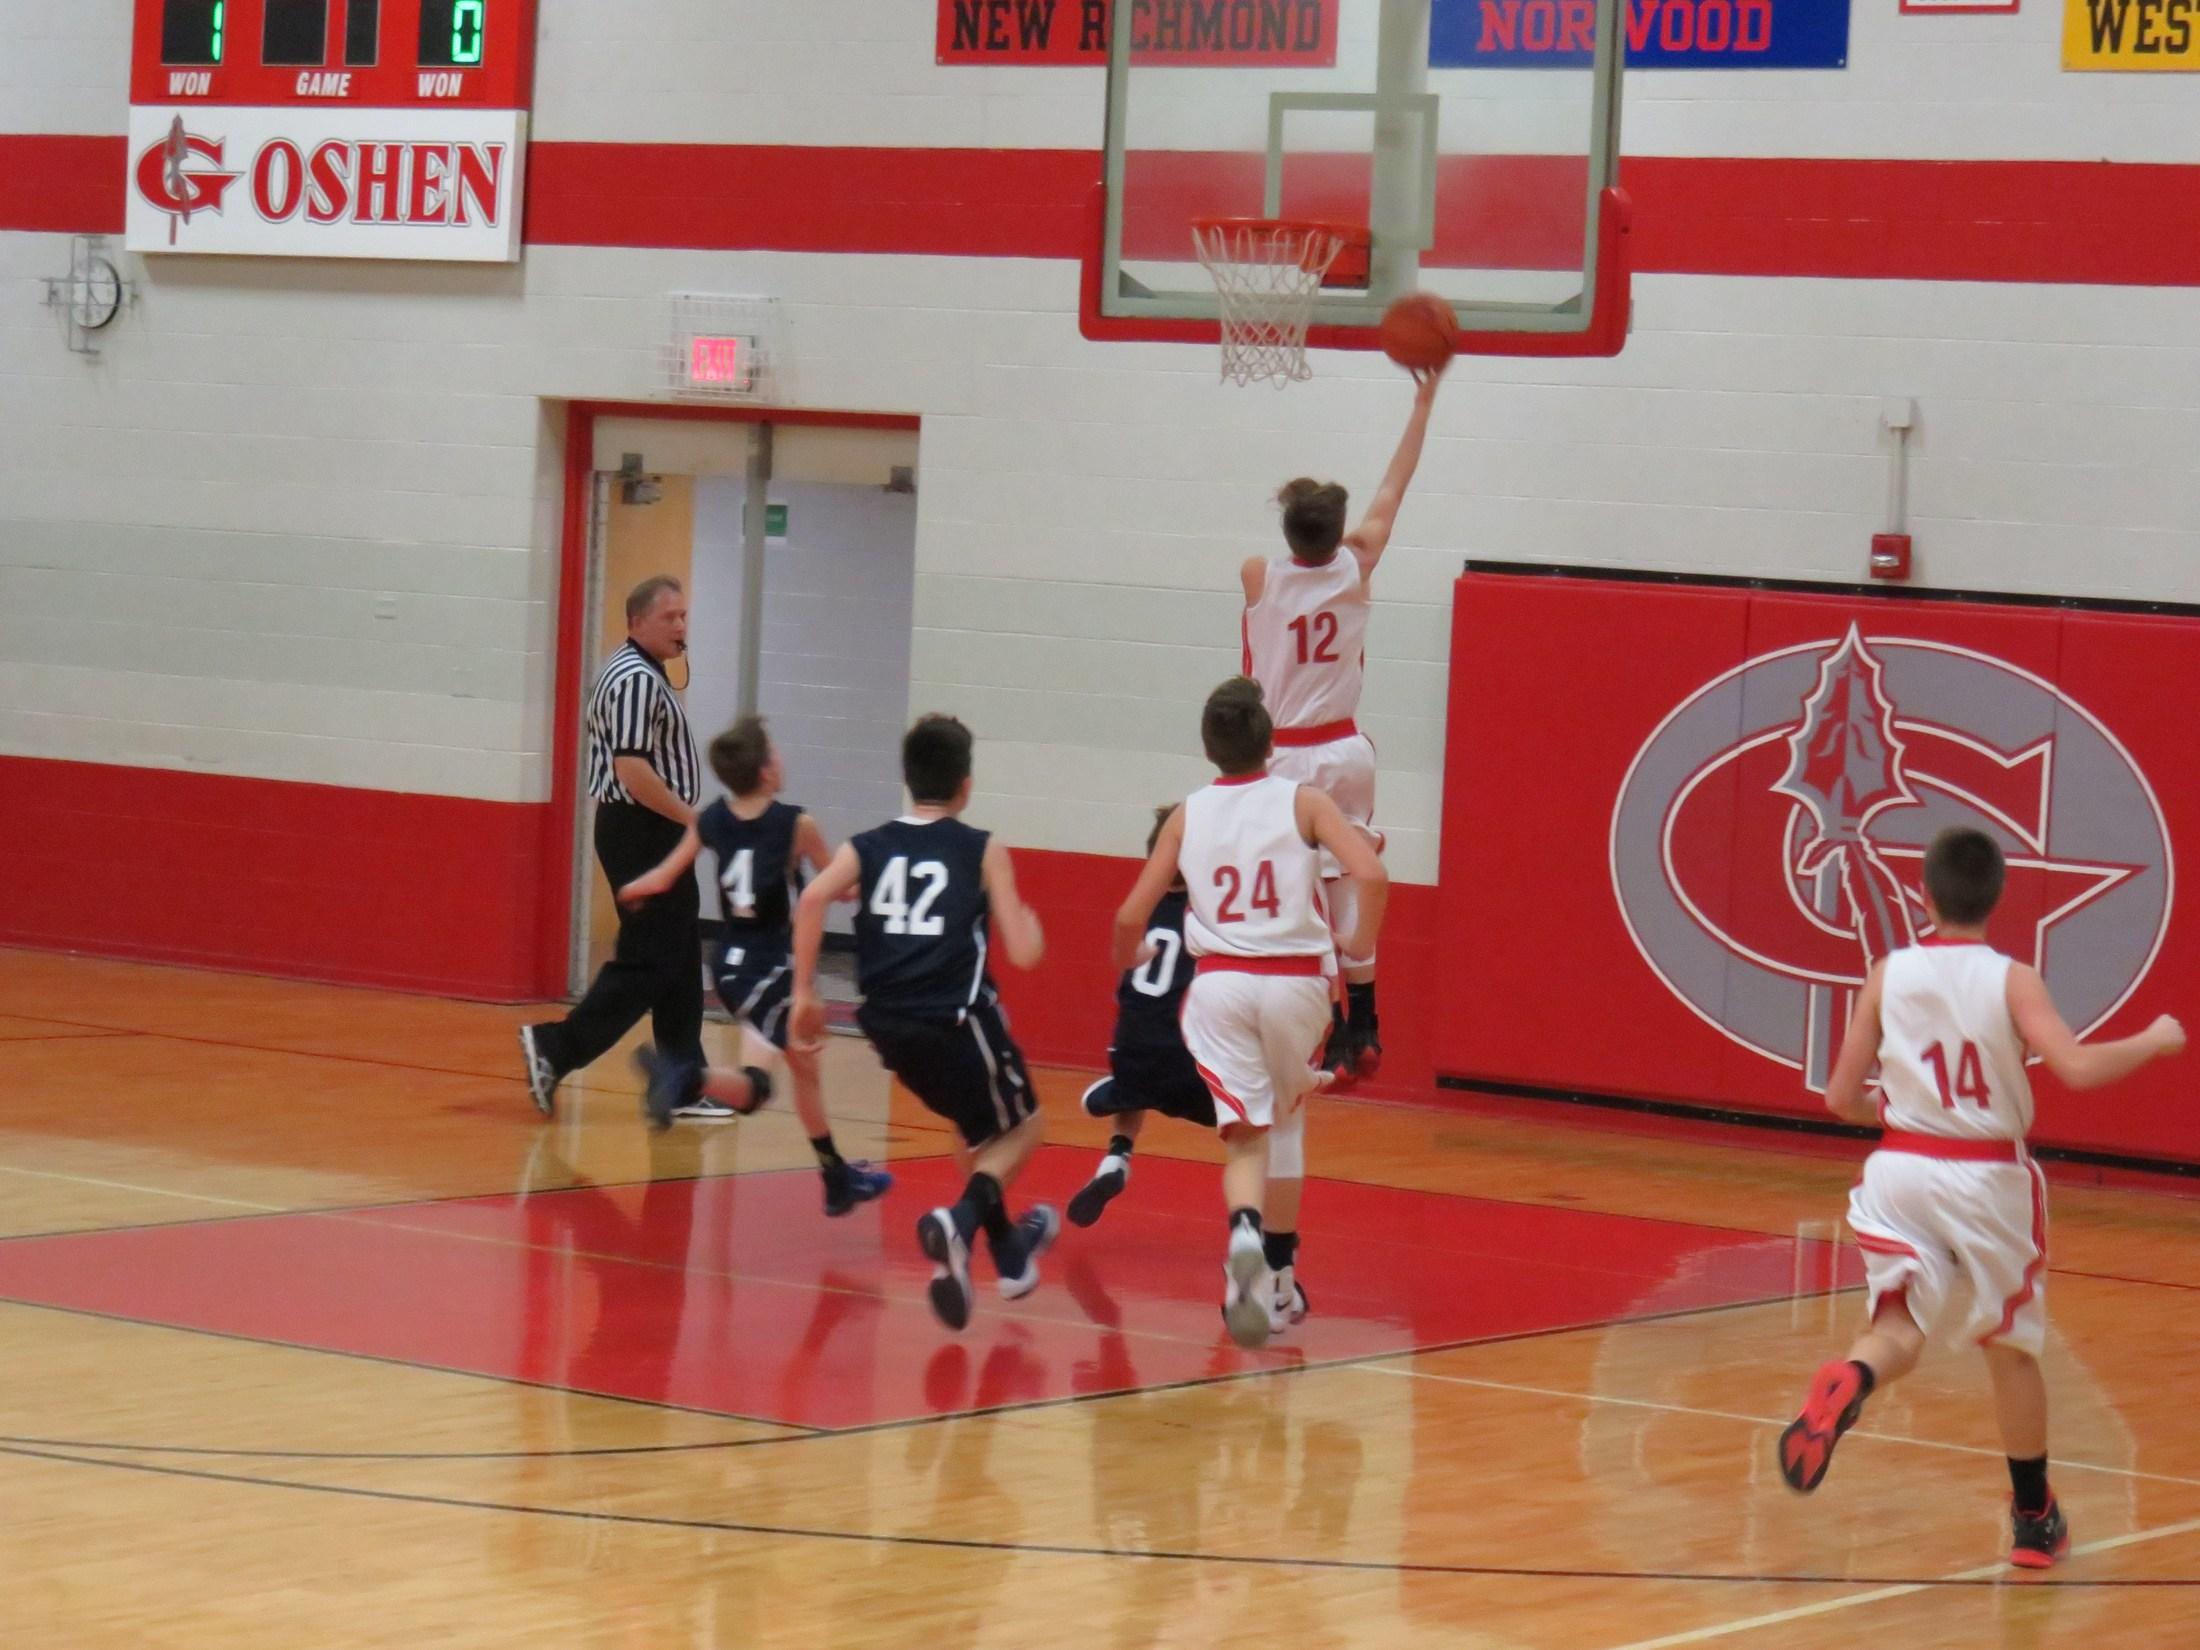 7th grade boys basketball player Hunter Haley